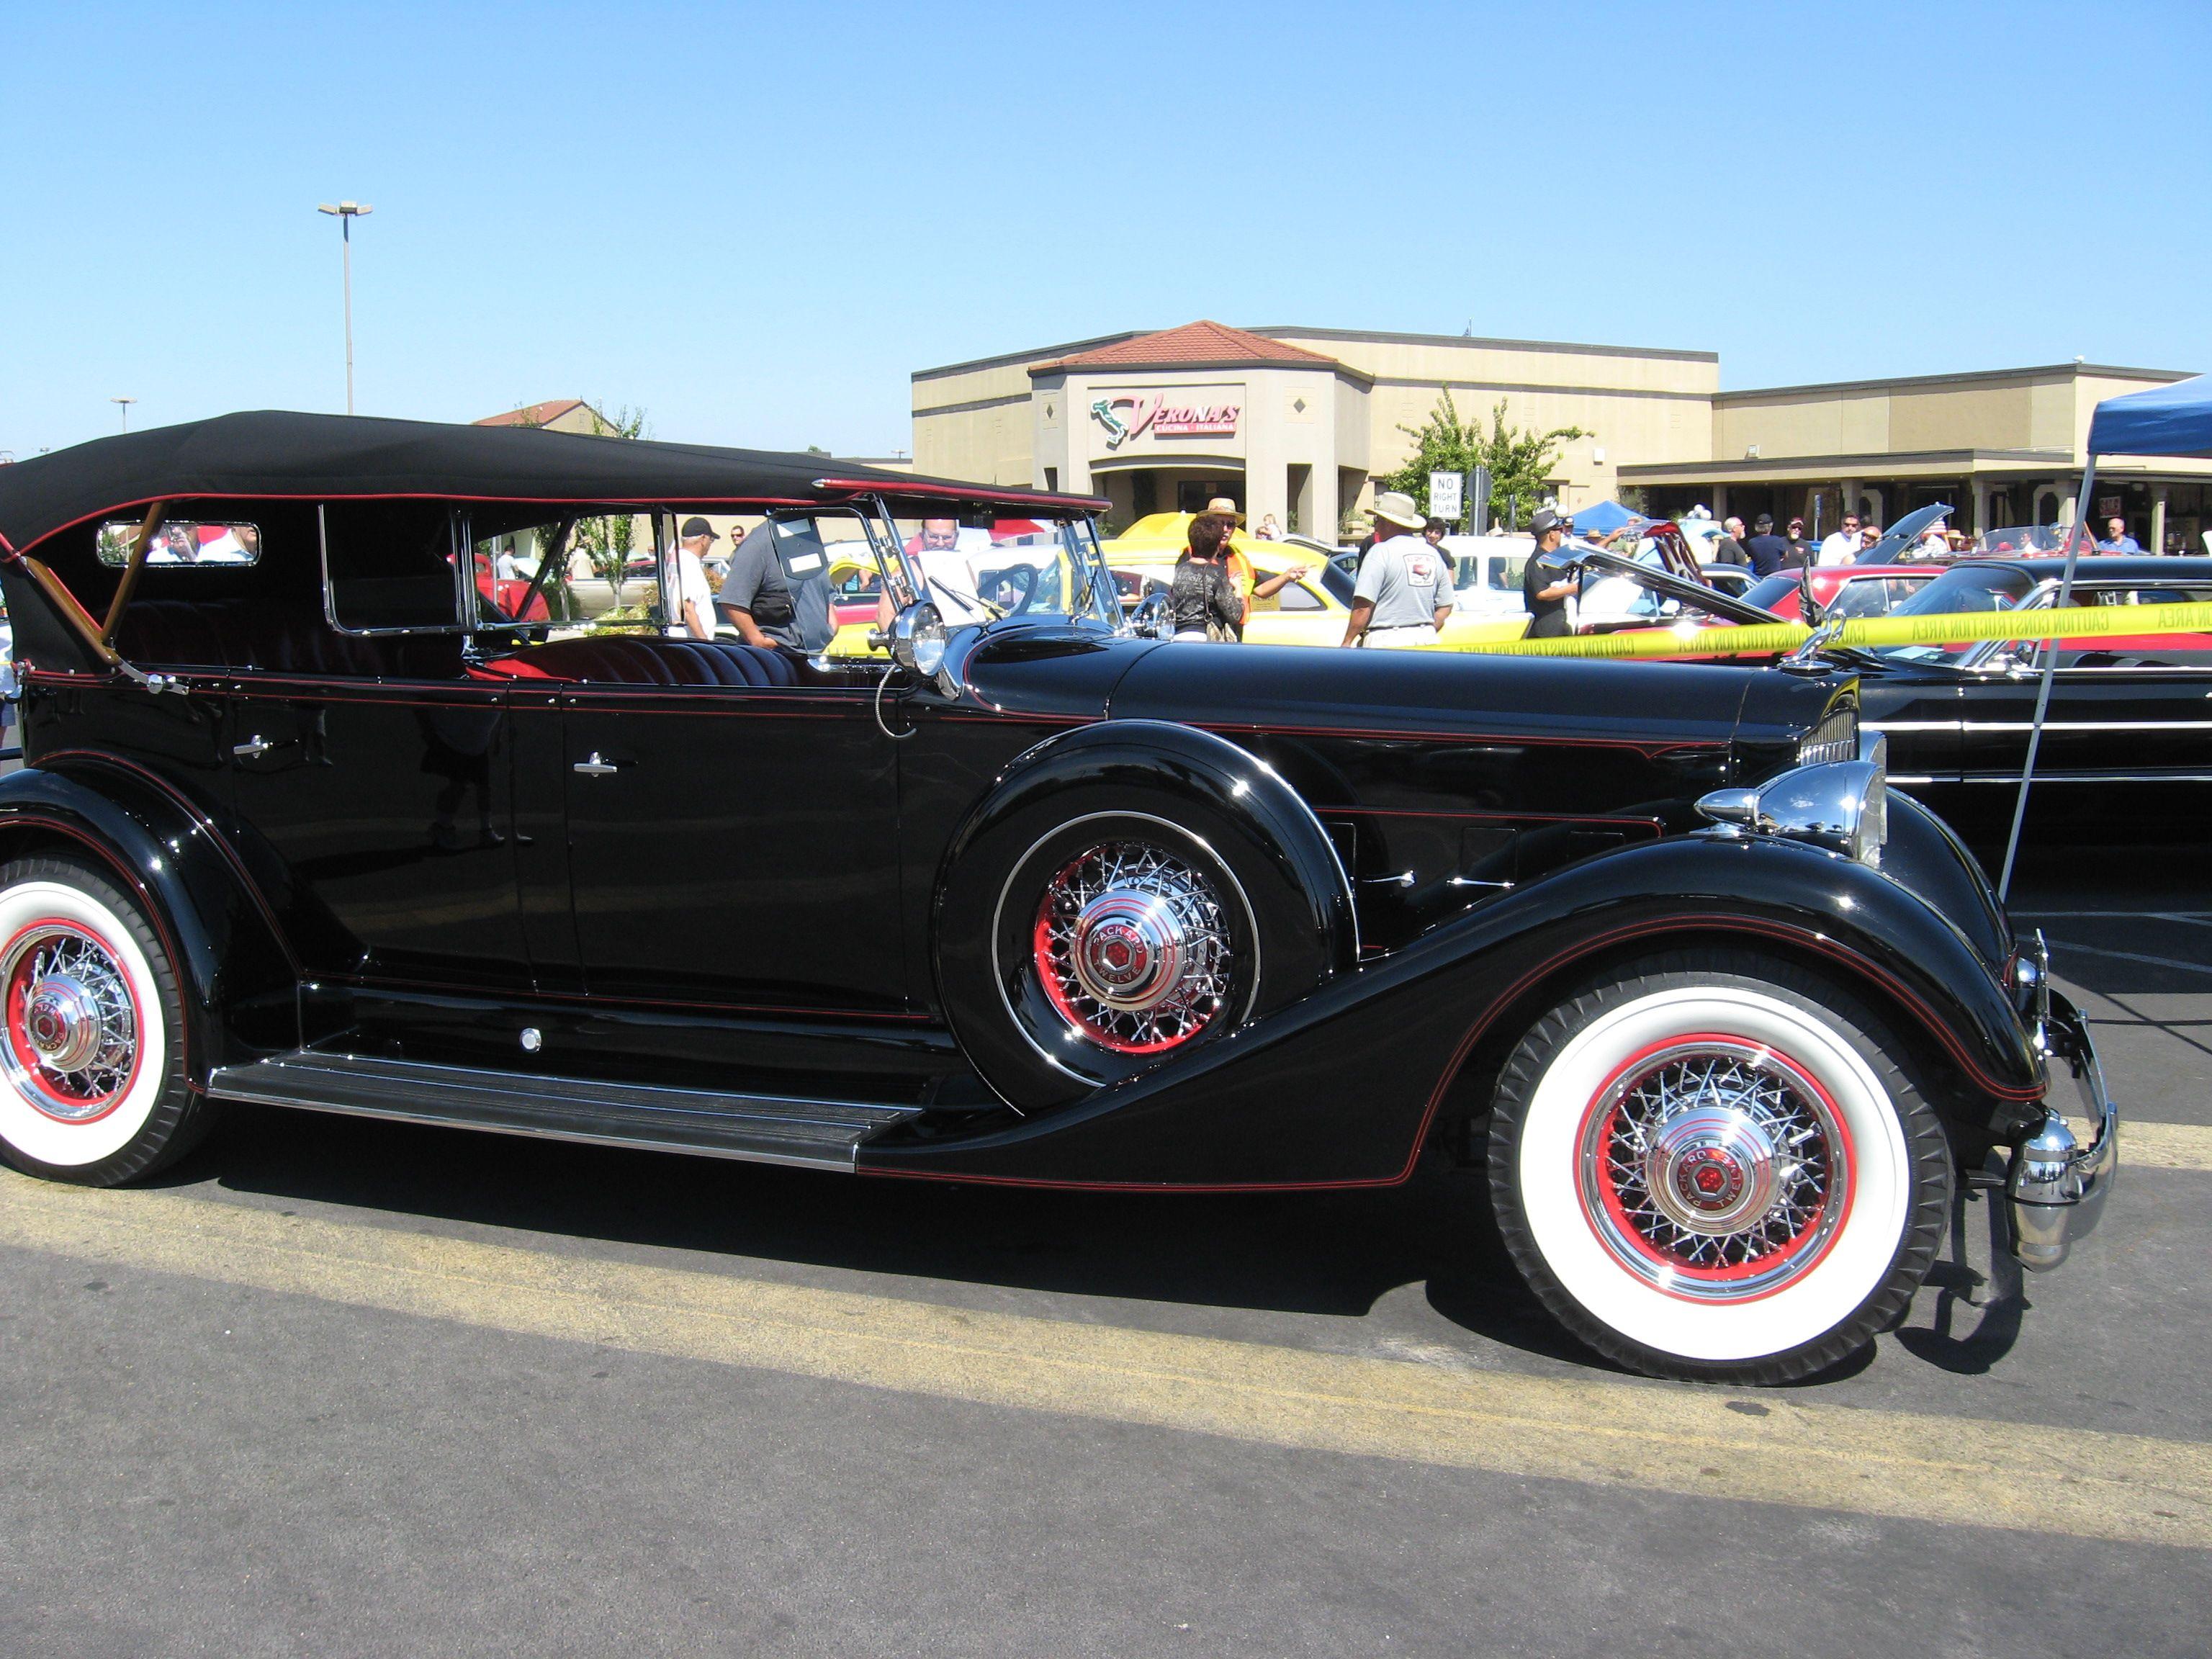 Classy Classic Cars Pinterest Cars - Classy classic cars